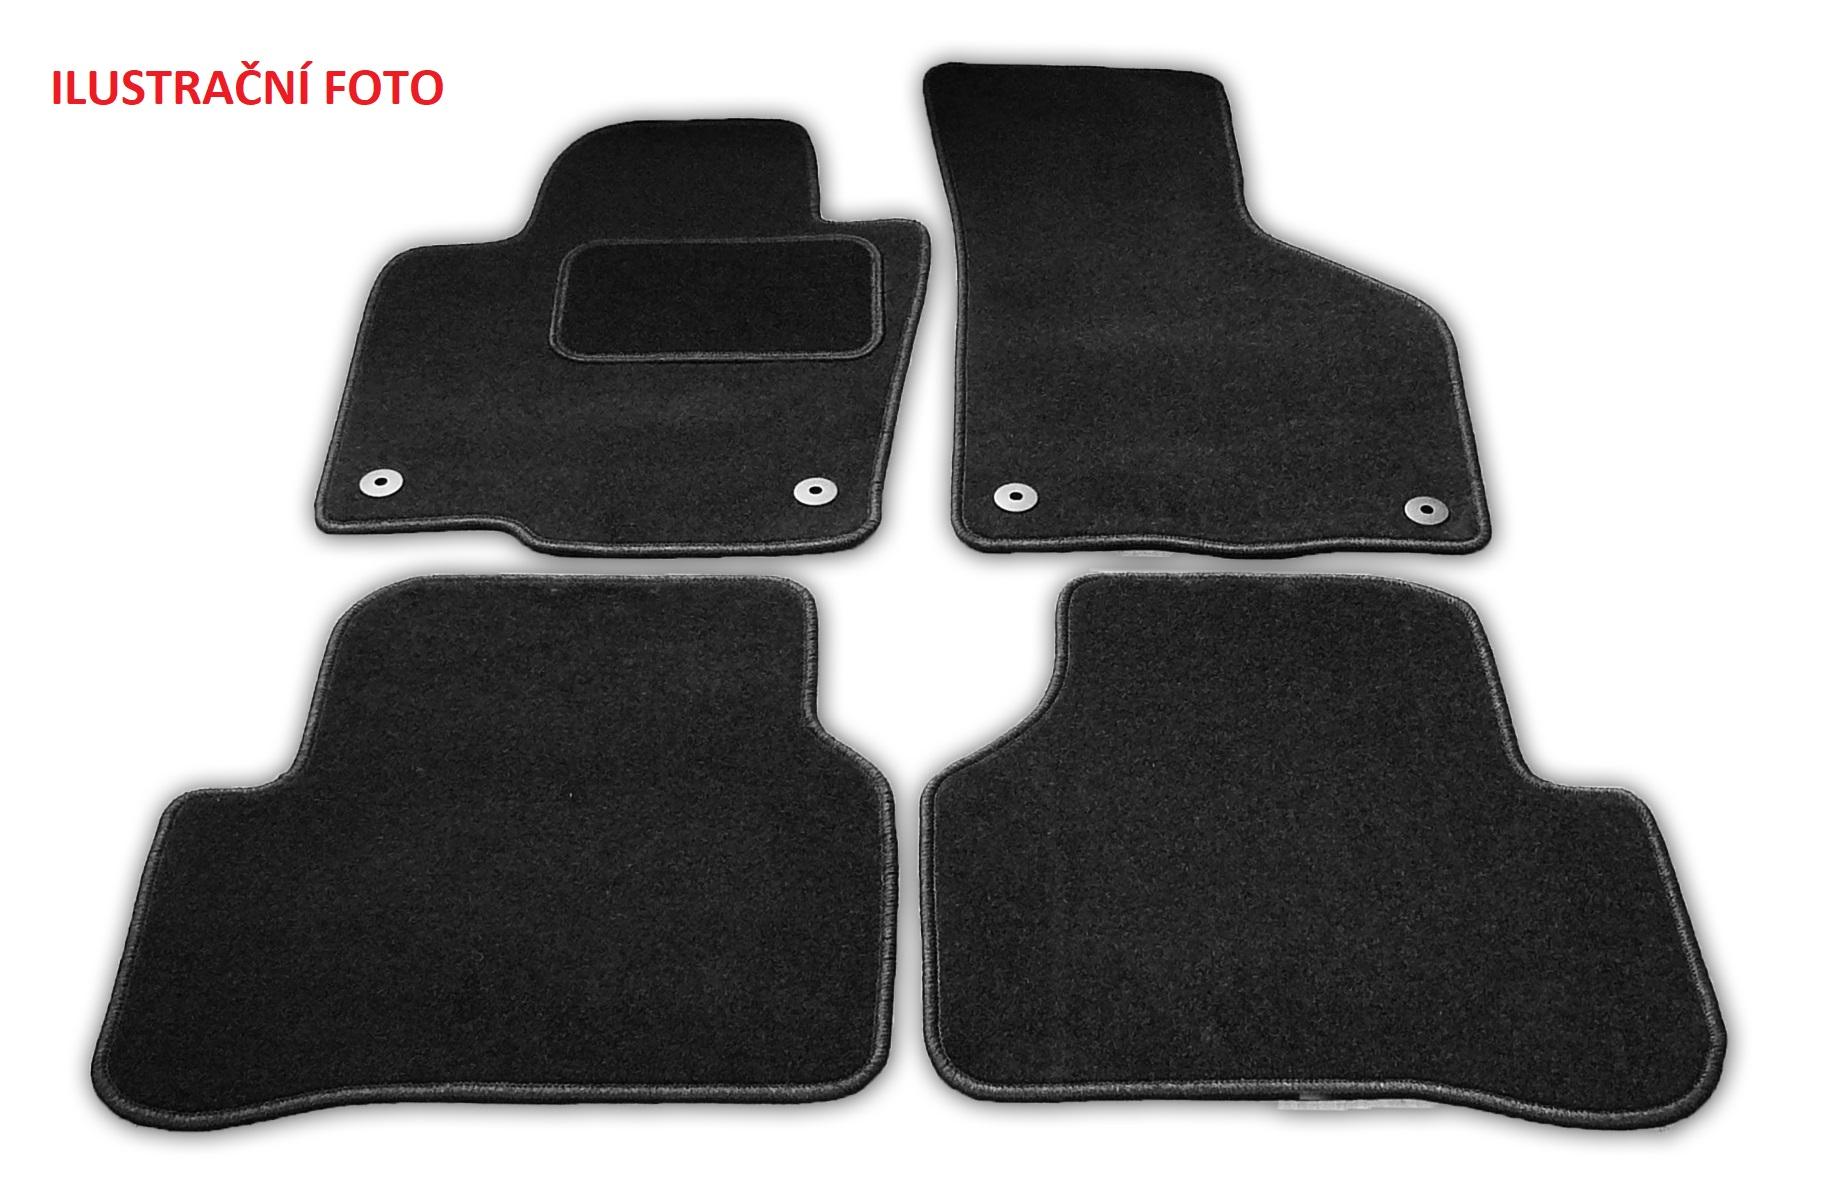 Automega Textilní autokoberce Standard Ford Fiesta 2008-2017